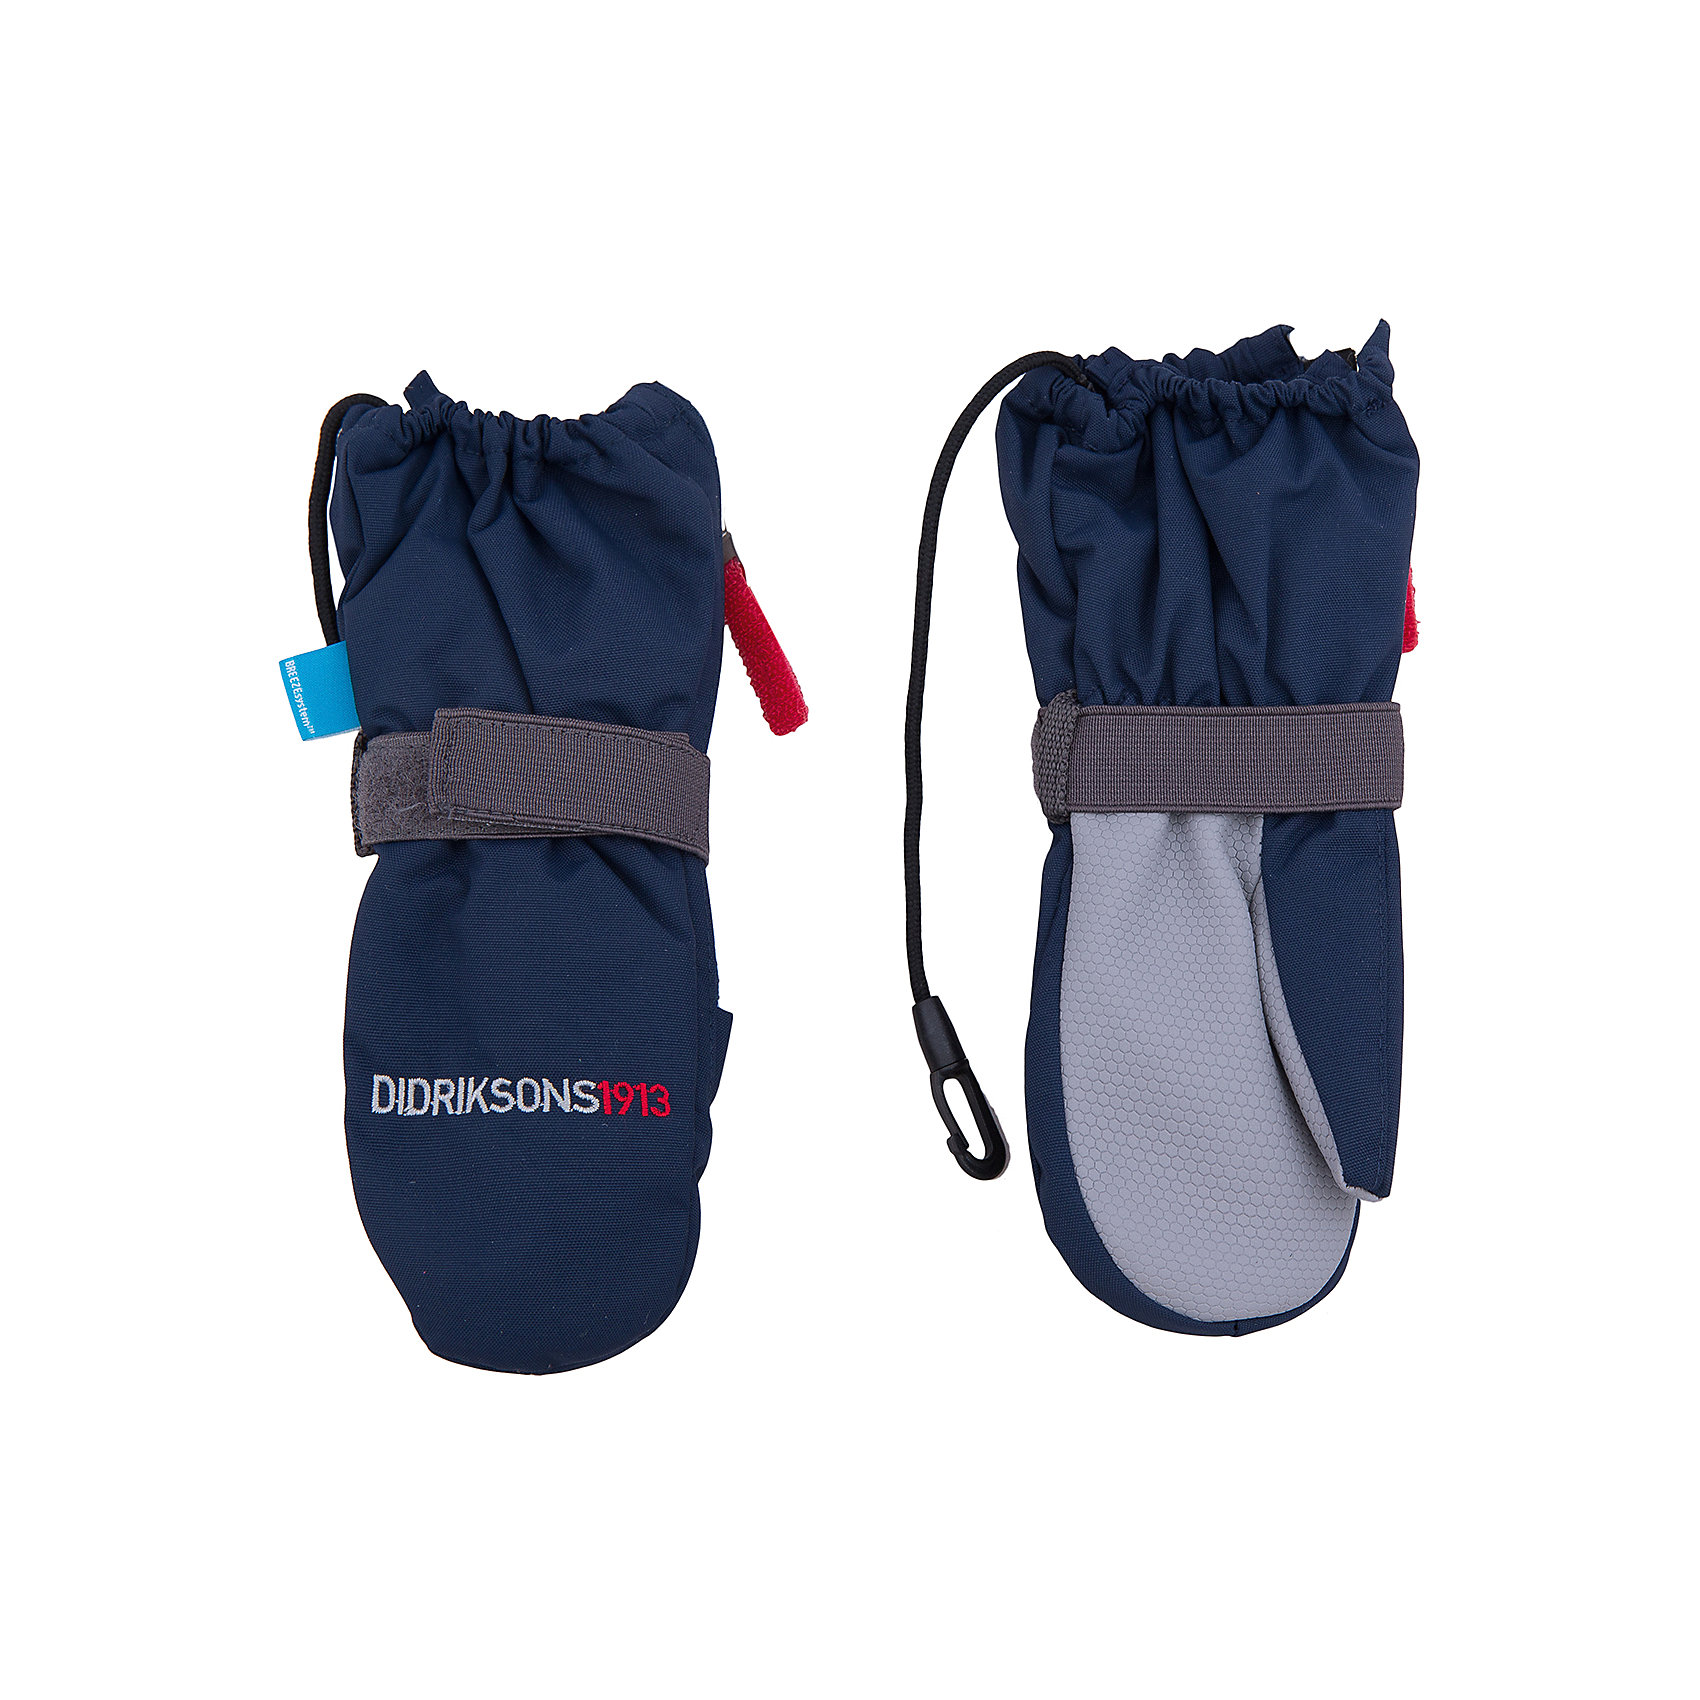 DIDRIKSONS Варежки DIDRIKSONS didriksons didriksons перчатки five 60гр морской бриз